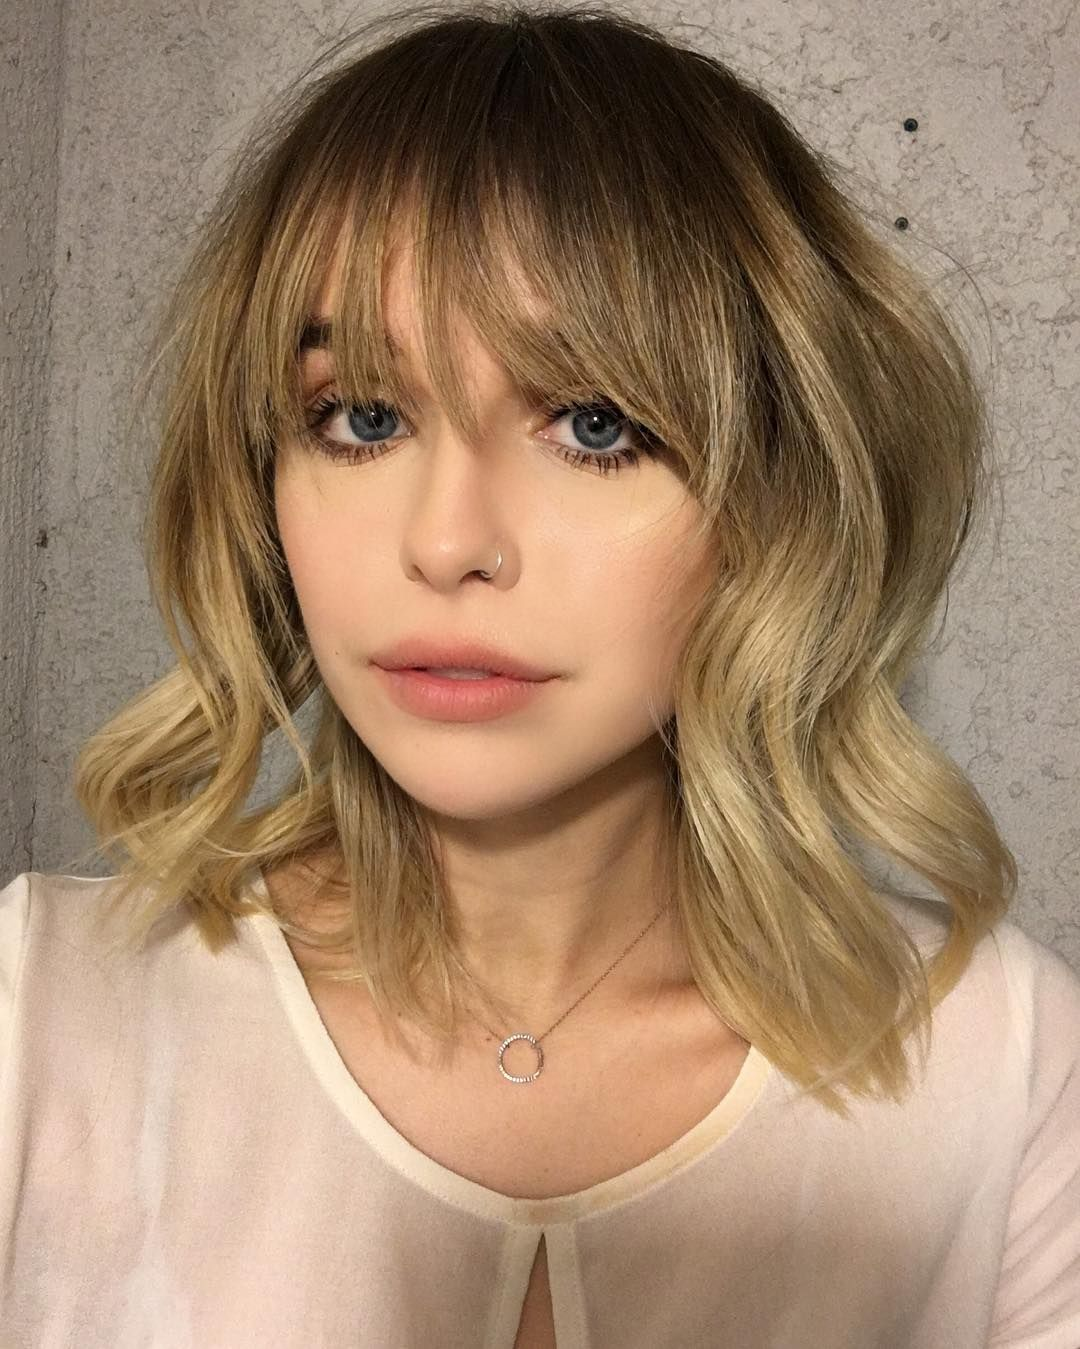 See This Instagram Photo By Acaciabrinley 105 6k Likes Hair